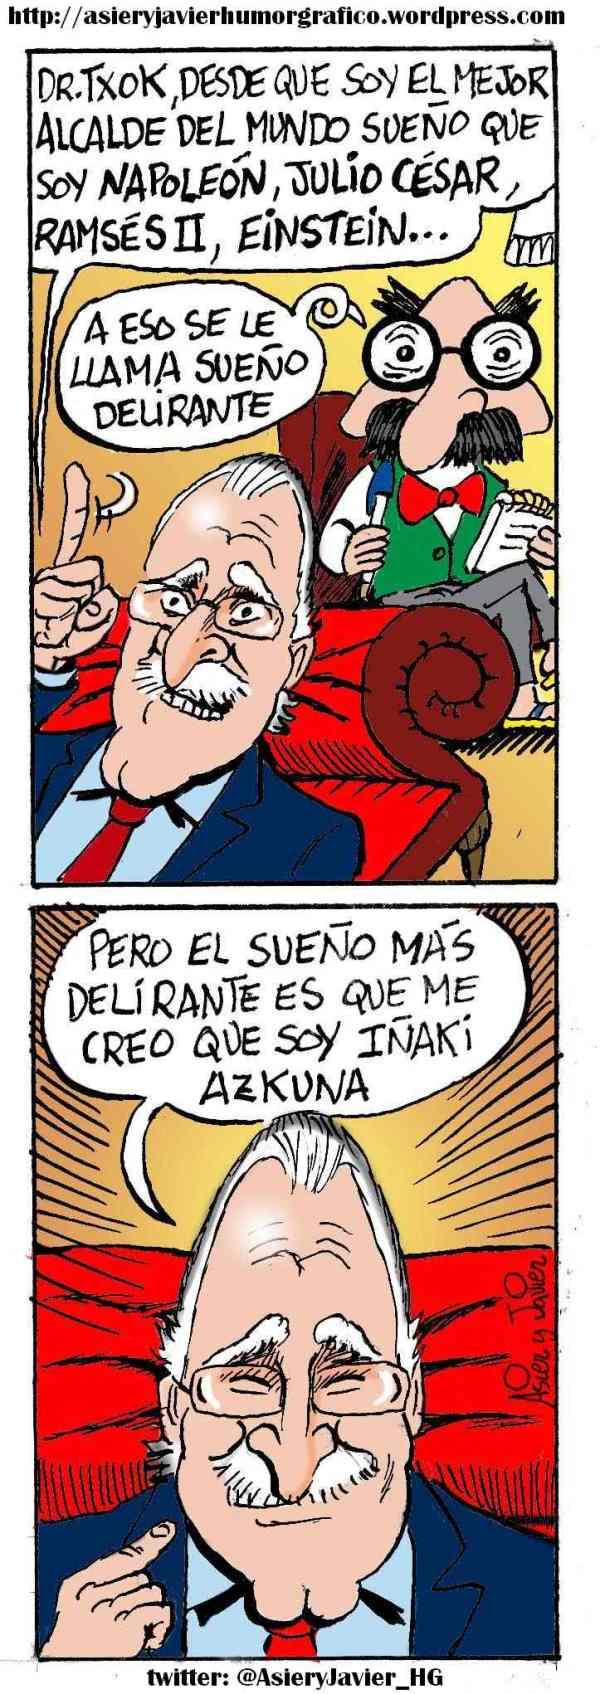 Iñaki Azkuna pasa por la consulta del Doctor Txok